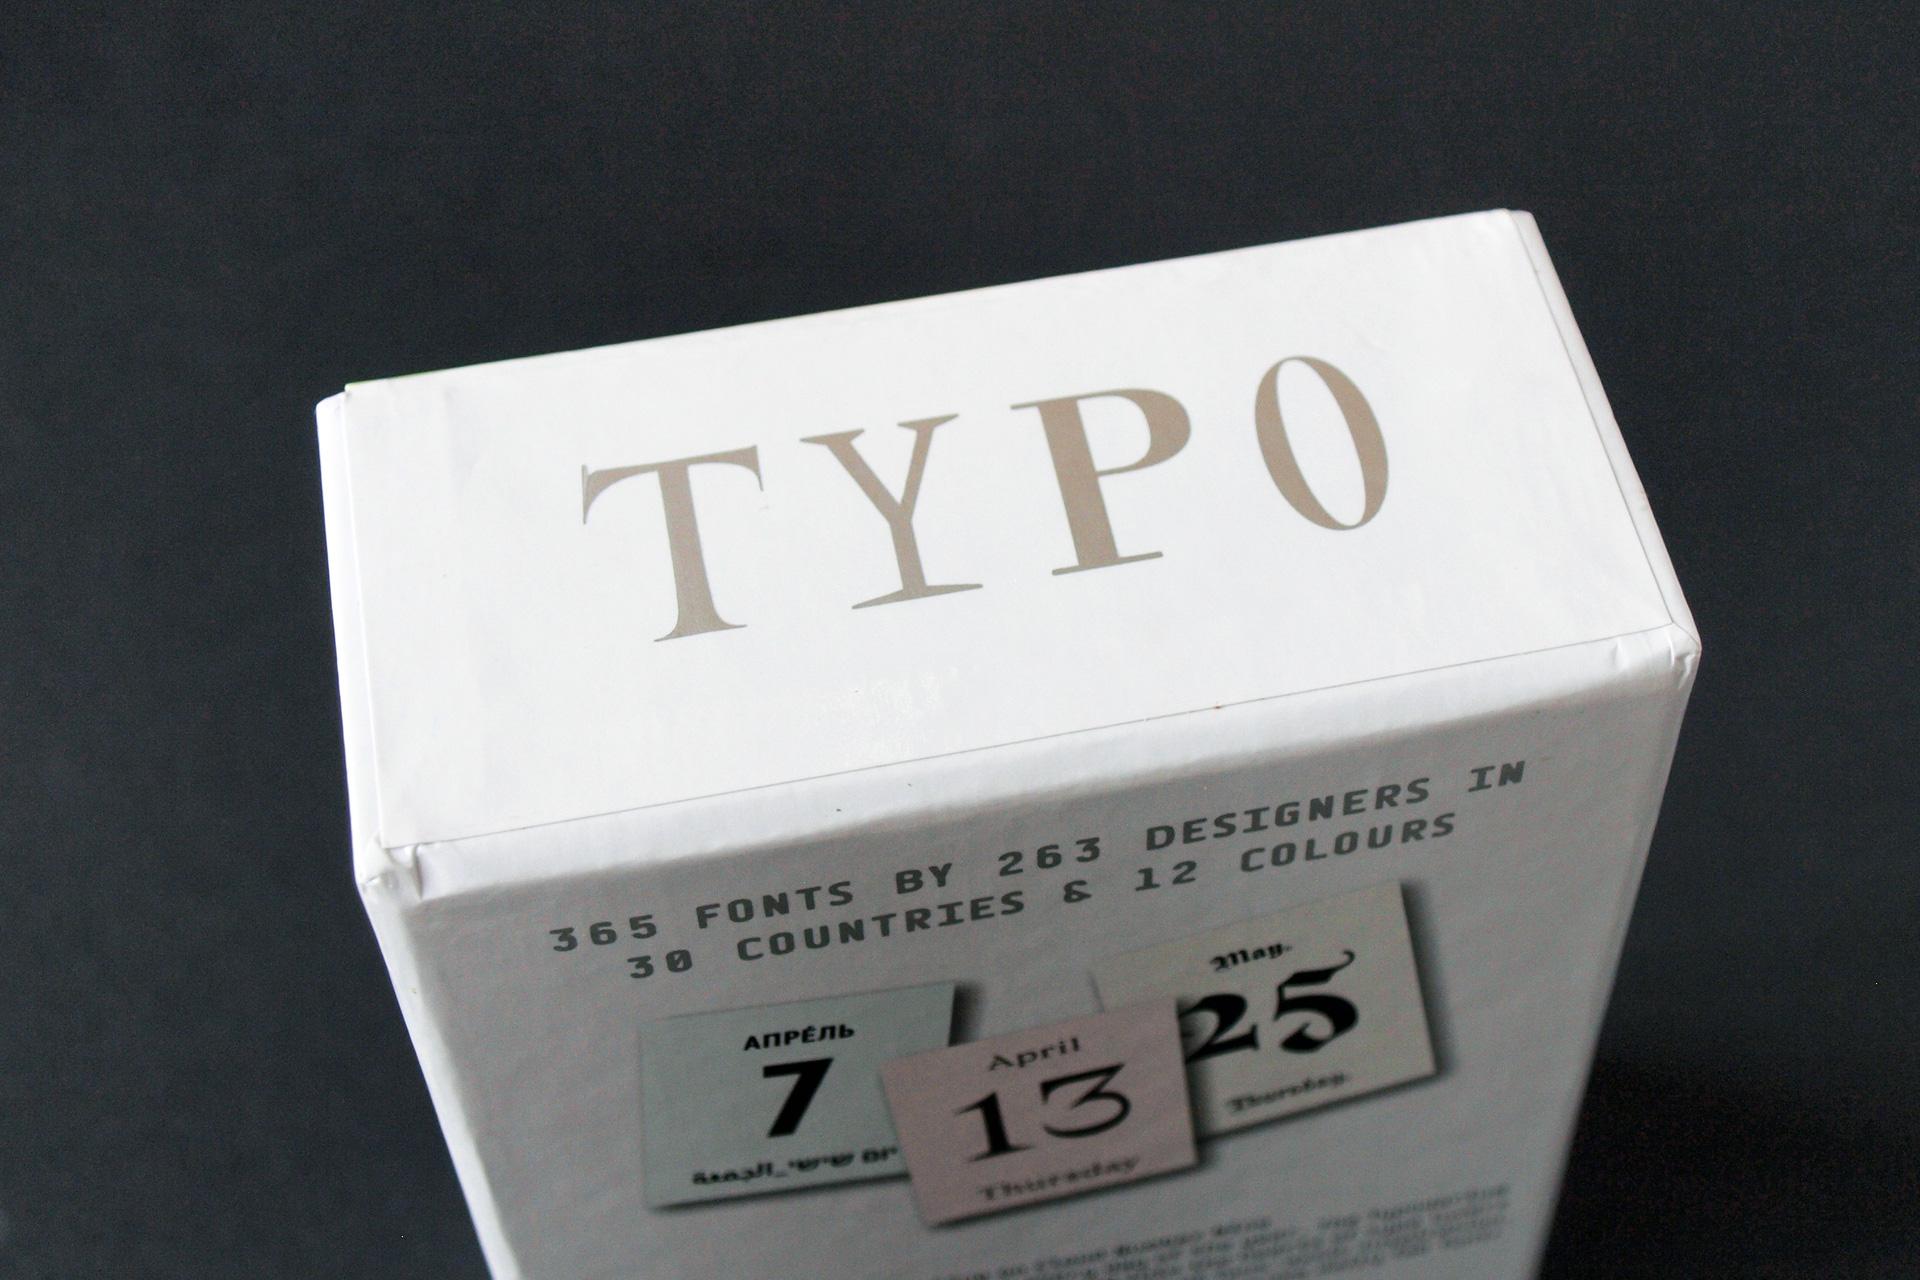 buchstabenplus, typodarium